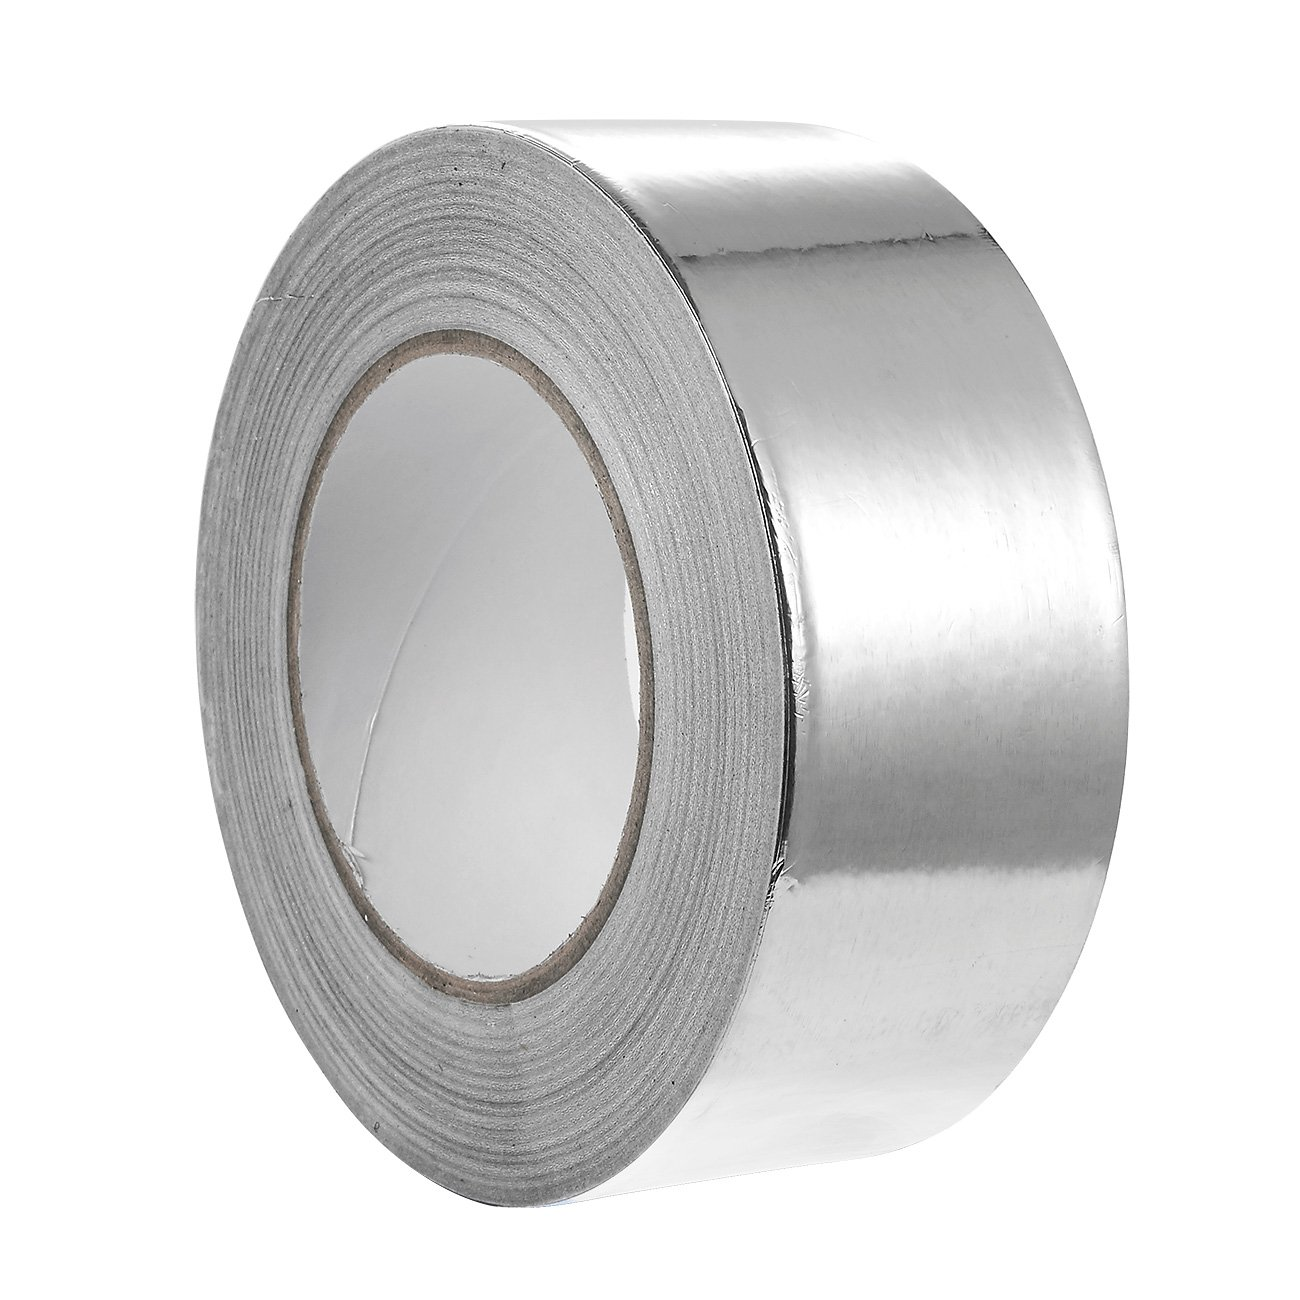 1 Piece Aluminum Foil Tape - All-Purpose Multi-Surface Silver Adhesive Duct Tape Equipment Repair, Industrial Work - 55 yards